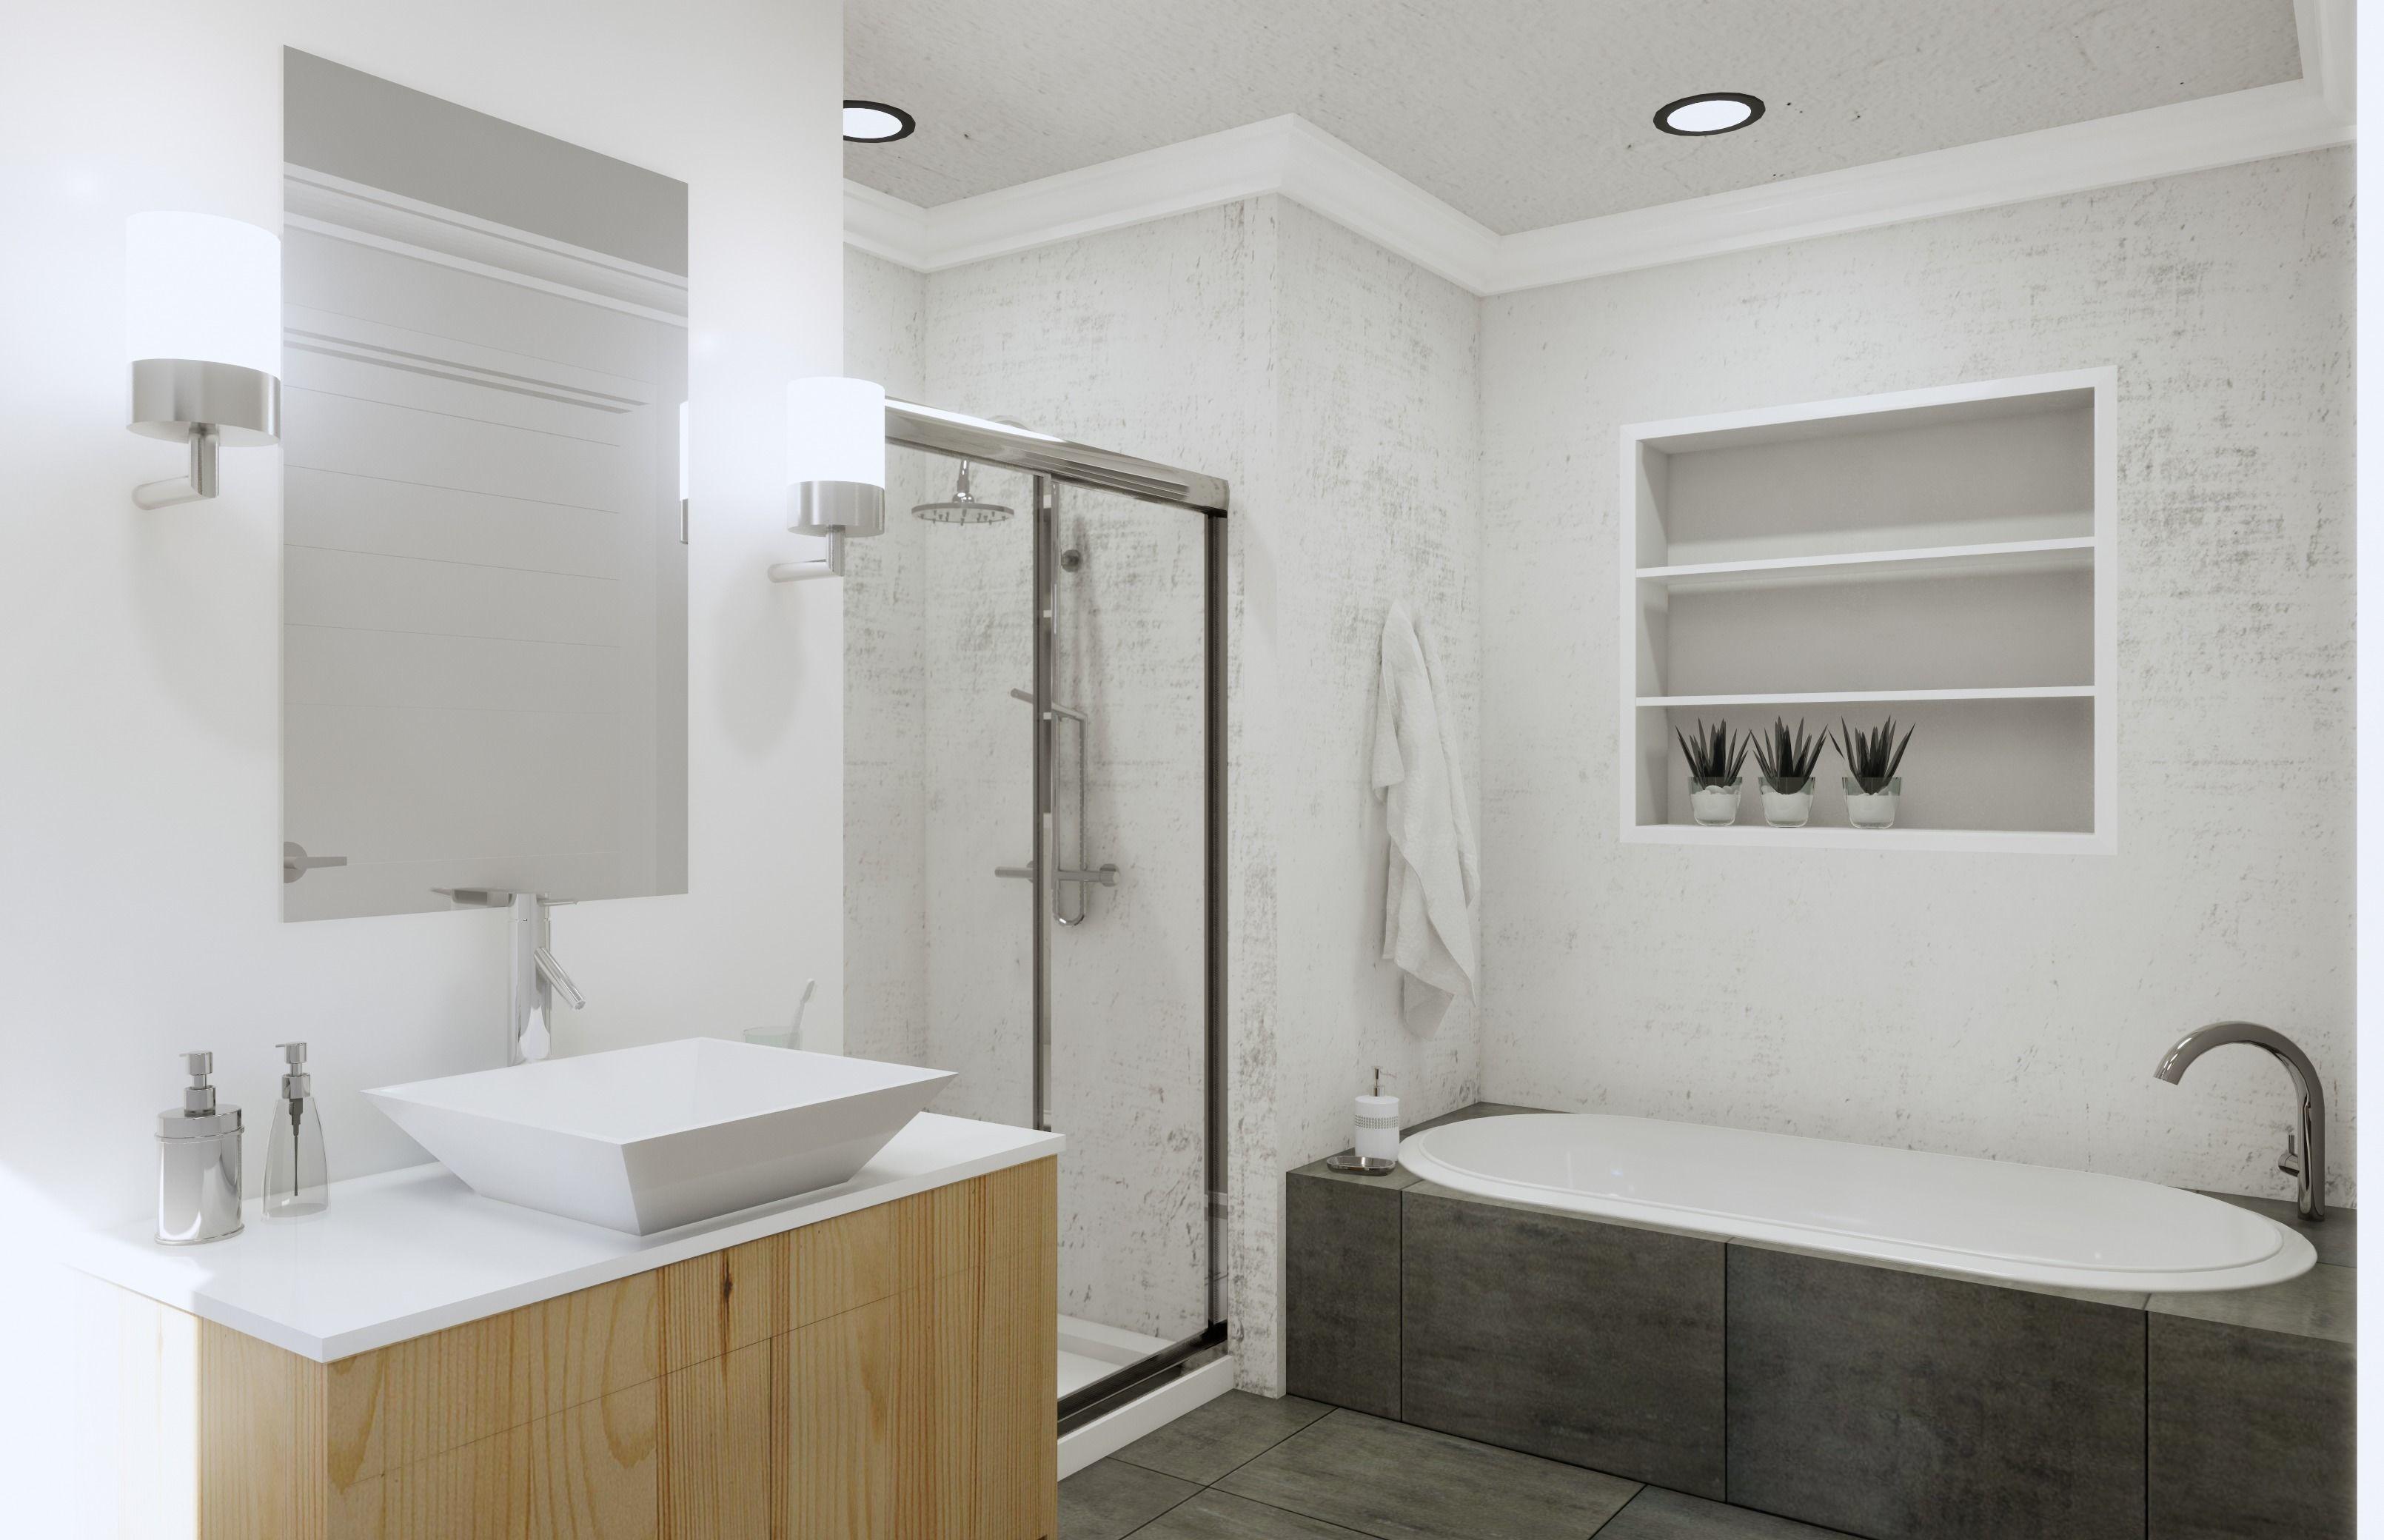 Bathroom Revit Model Scene low-poly | CGTrader on Bathroom Model  id=96175